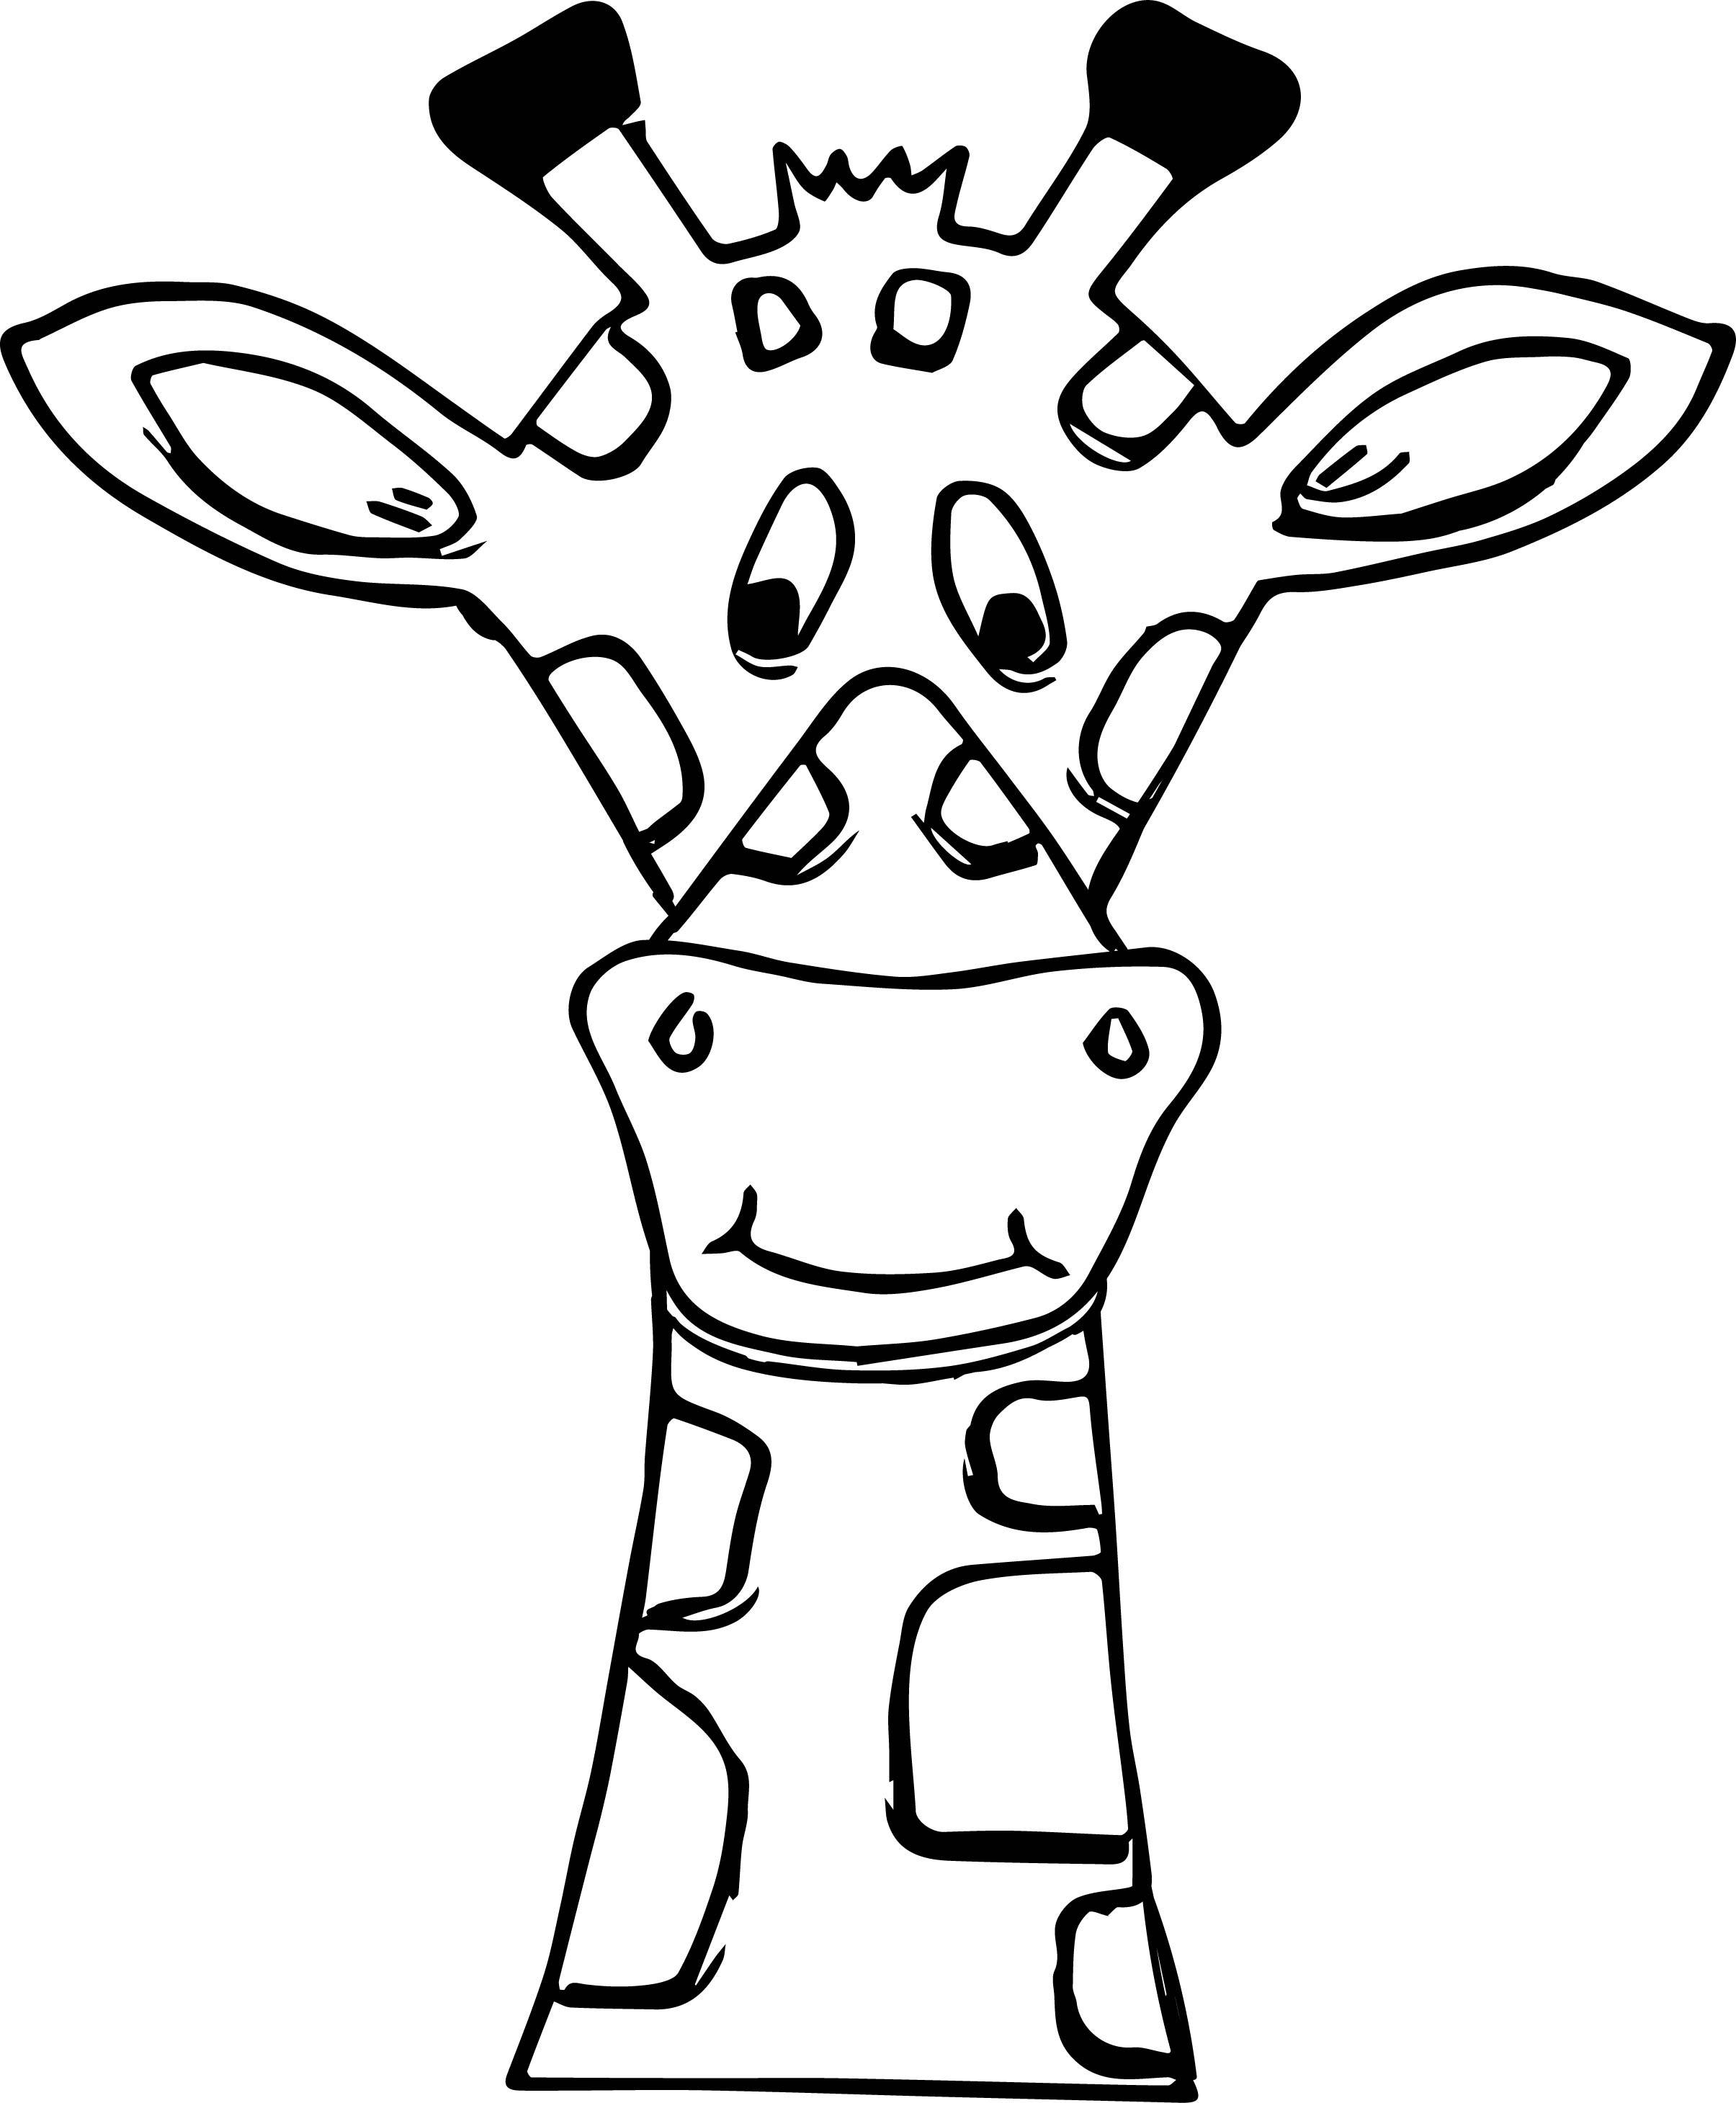 2410x2919 Unbelievable Zentangle Giraffe Stock Vector Illustration